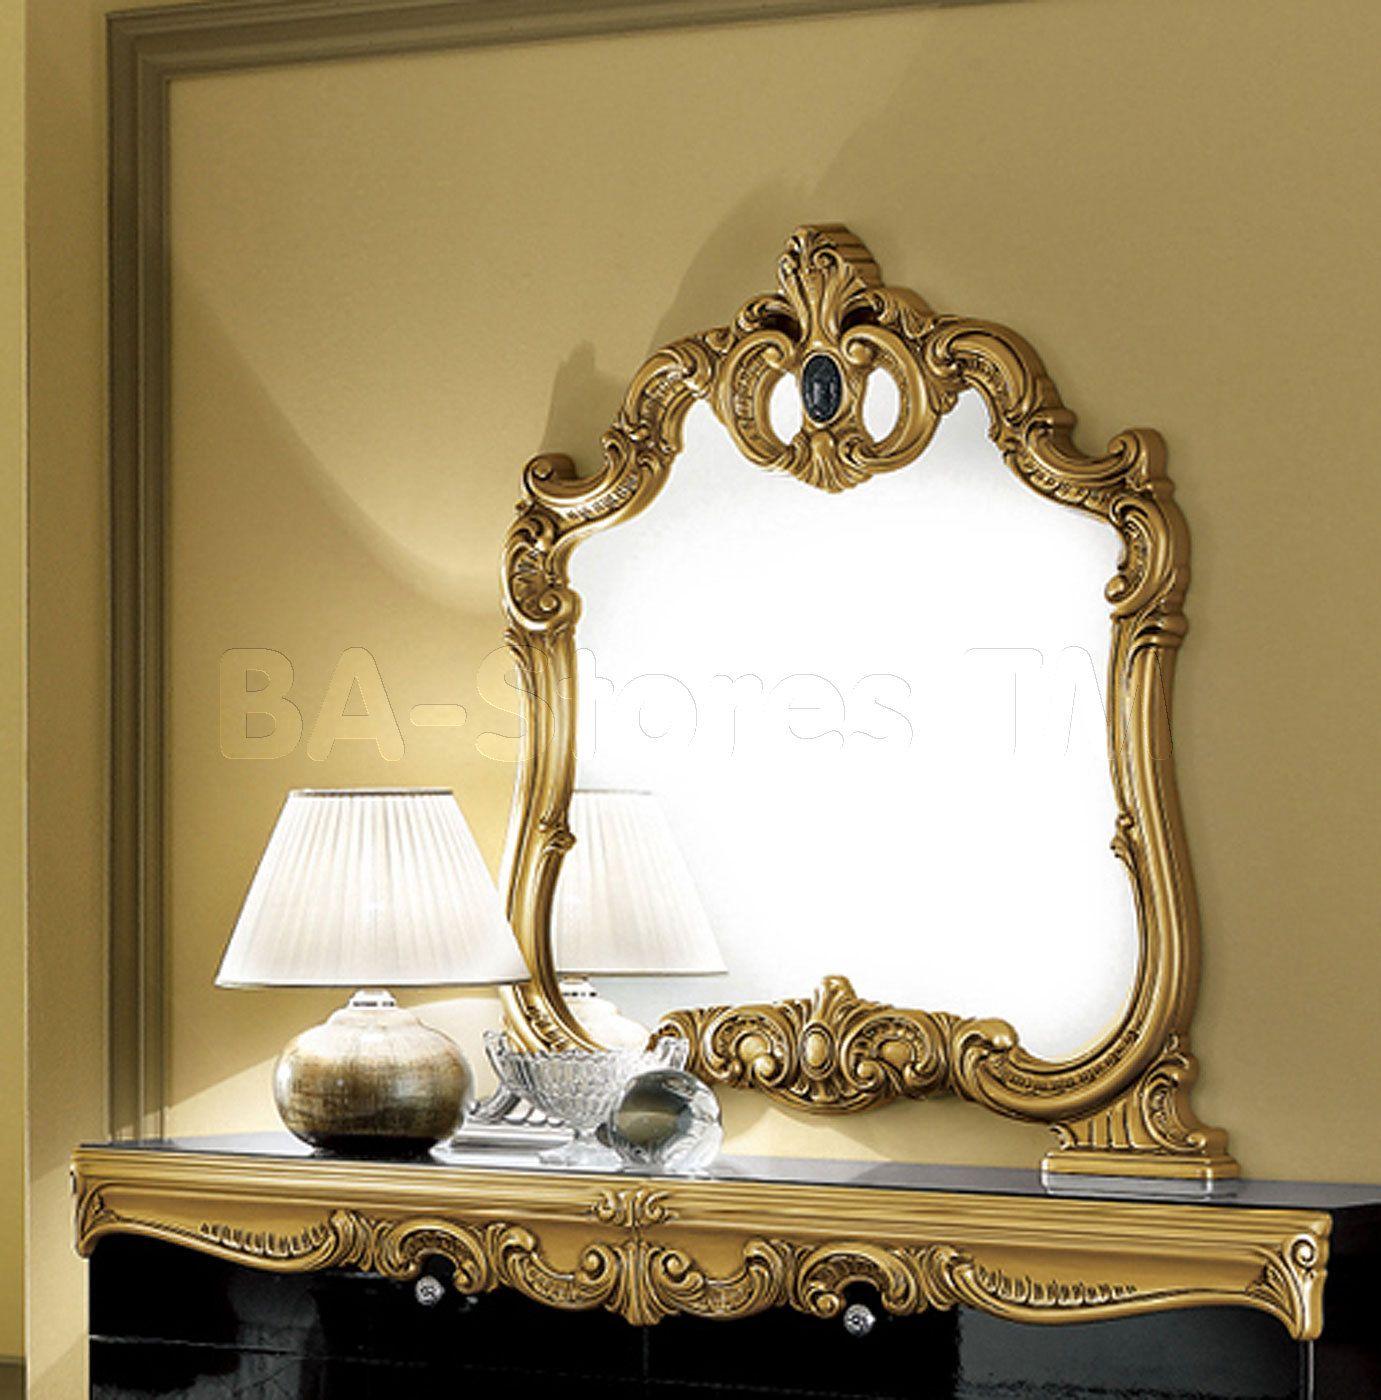 e22bd379e85 Shop for Barocco Gold Mirror - ESF Furniture